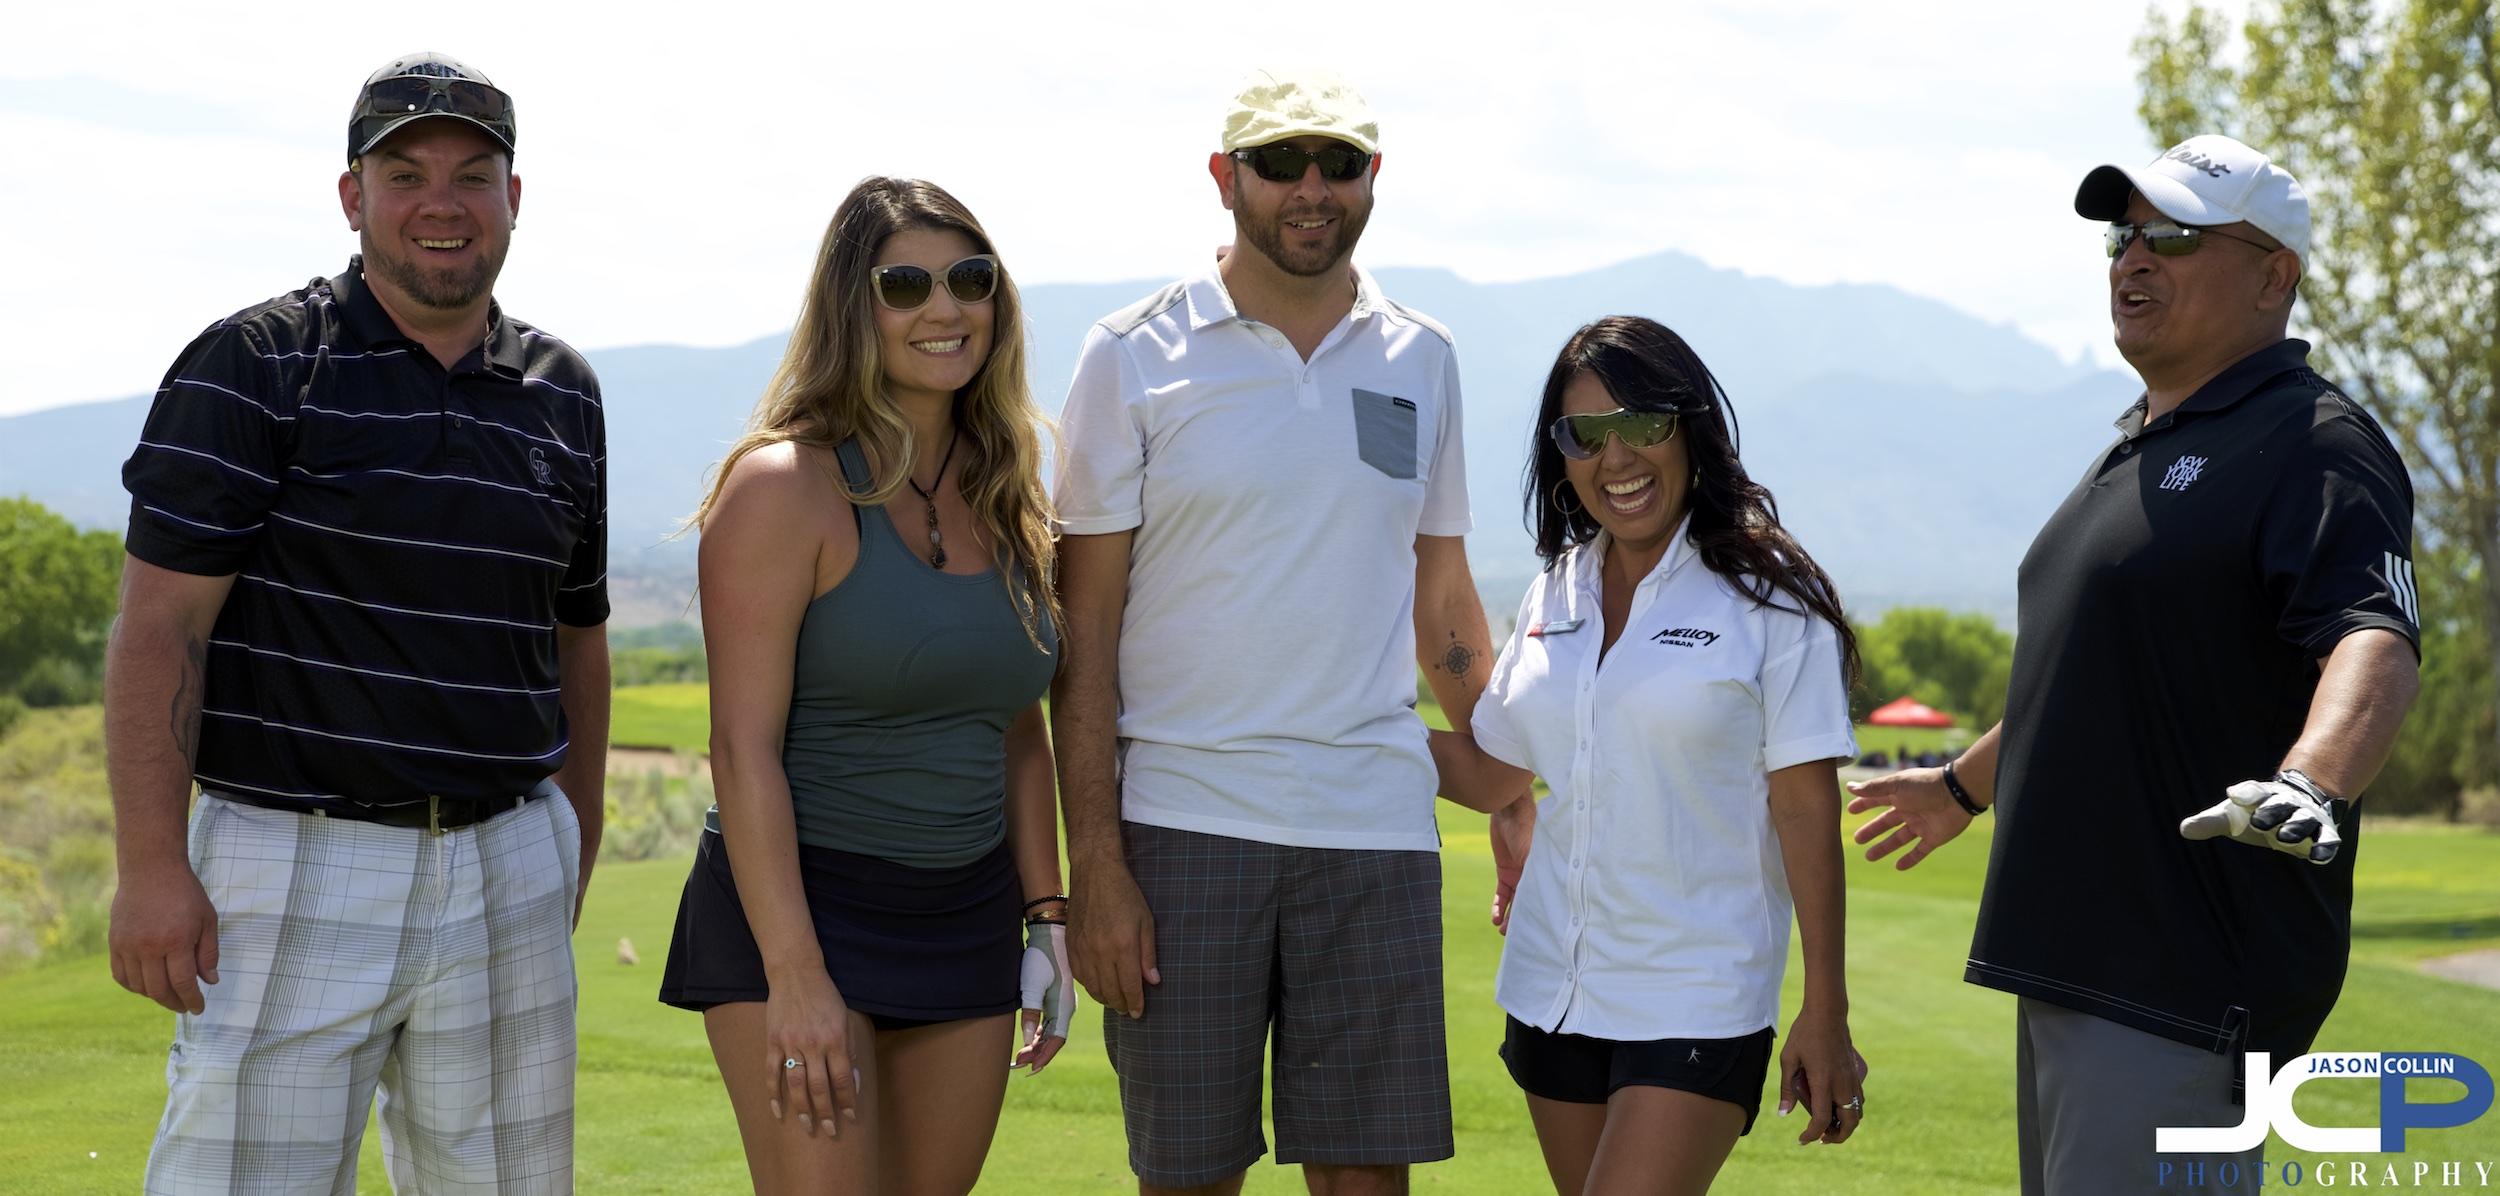 ahcc-8-16-2018-golf-100642.jpg